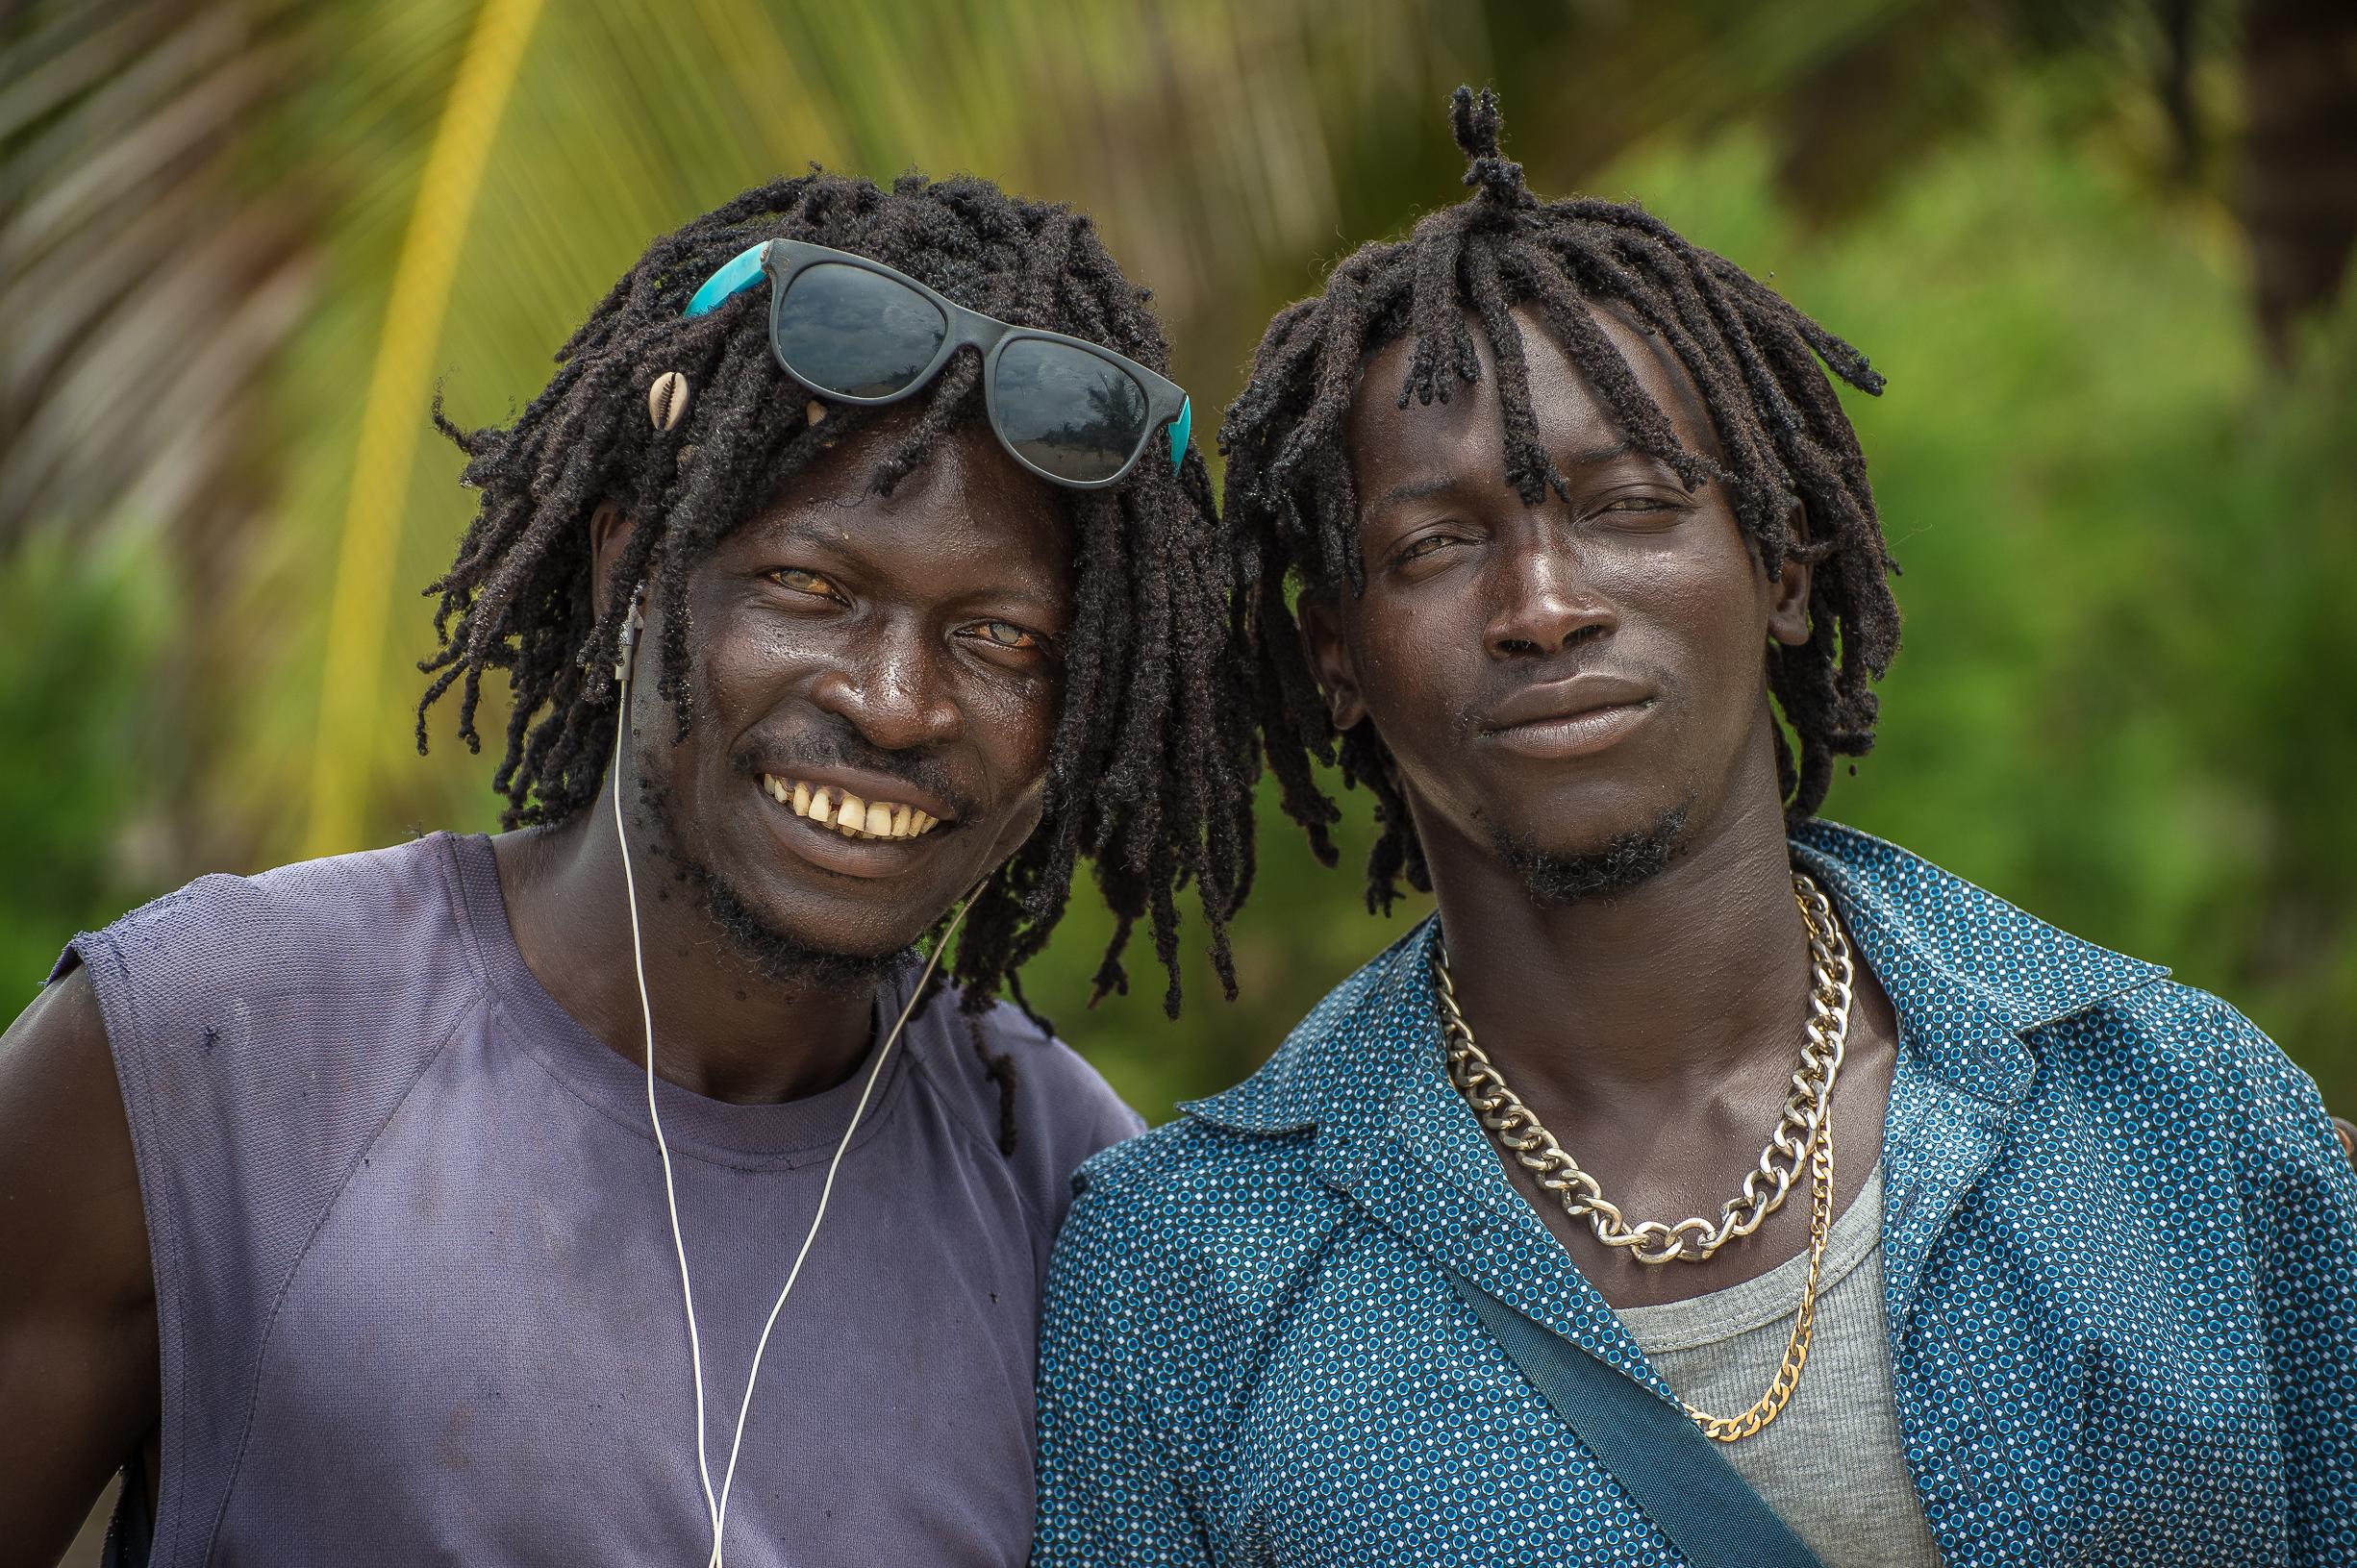 gambia-costa-eterna-sonrisa-africa